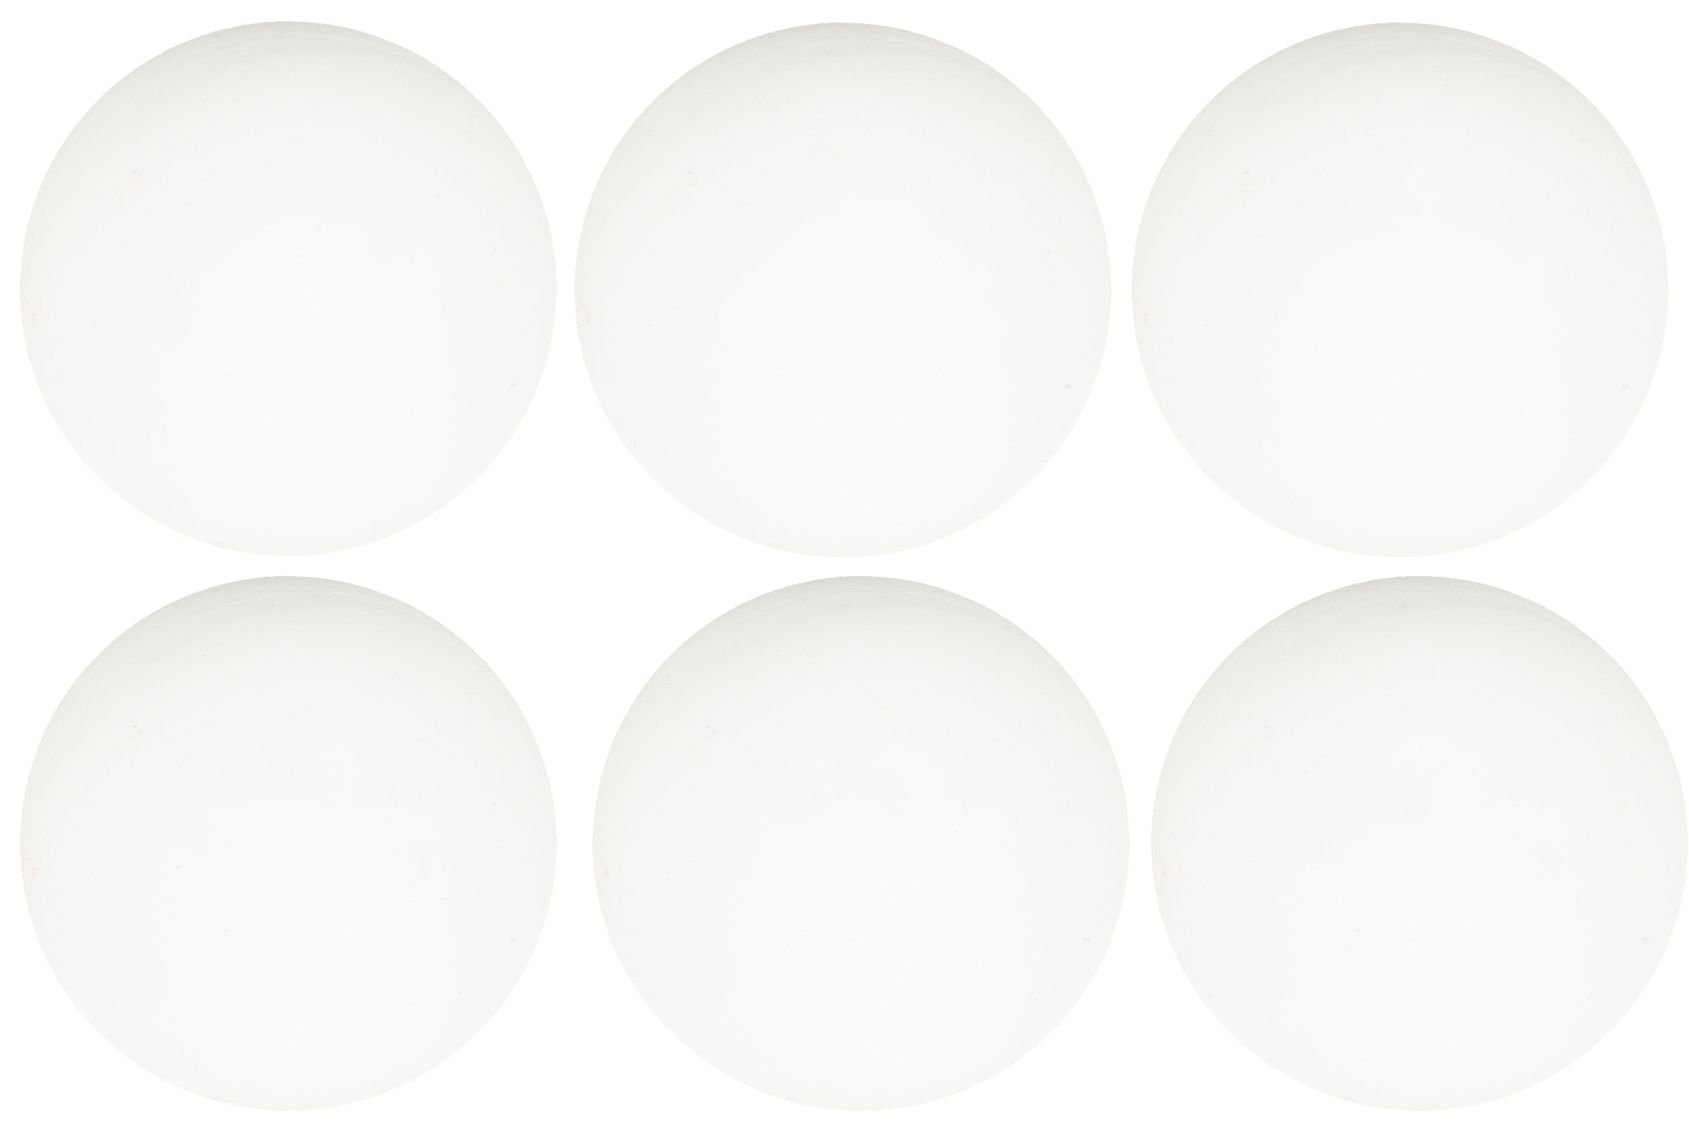 Tafeltennisballen PP in Koker • 6 Stuks •